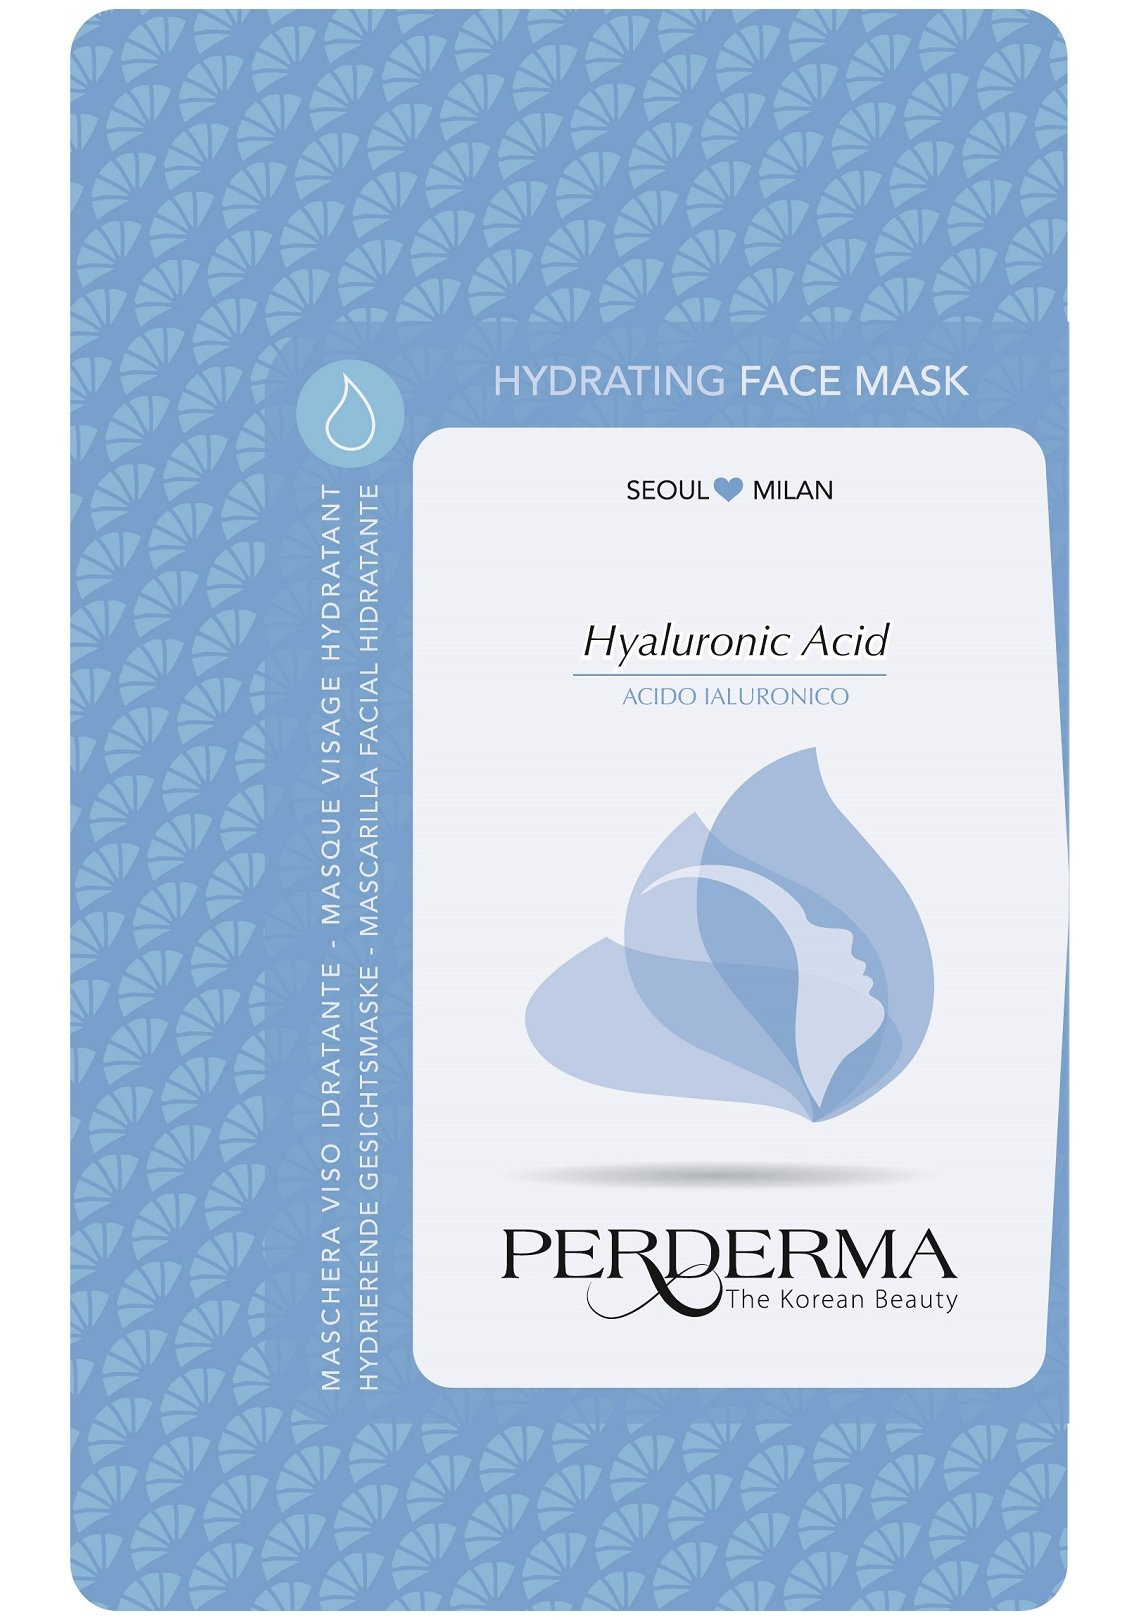 PERDERMA Moisturizing Face Mask With Hyaluronic Acid